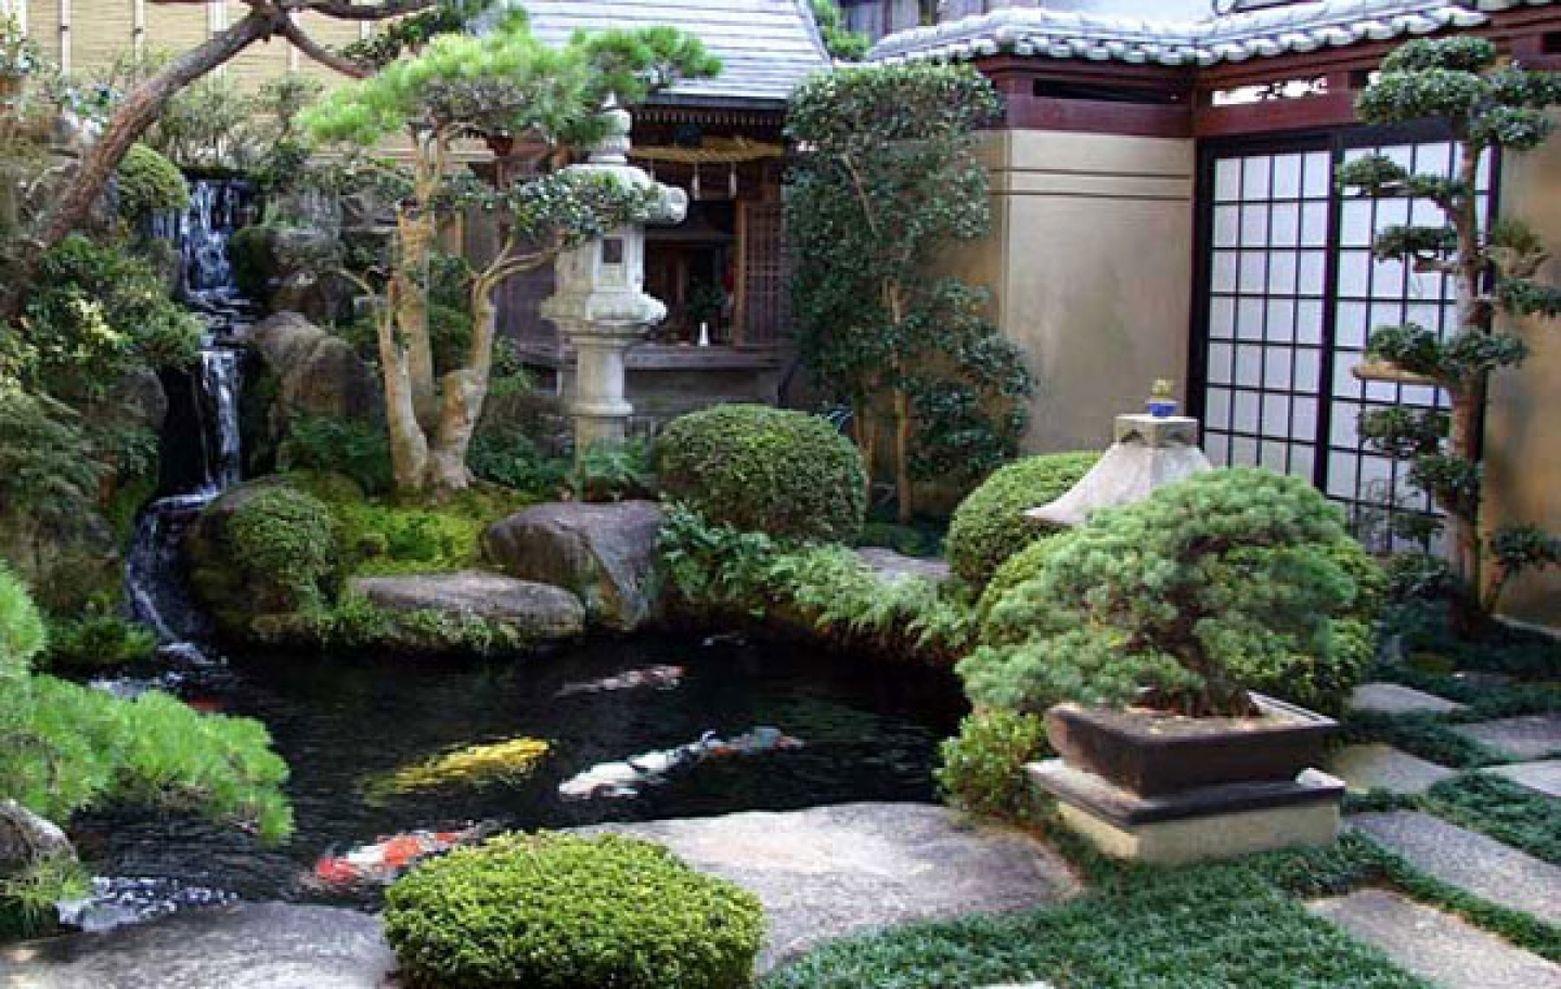 Japanese Garden Landscaping 63 beautiful modern japanese garden landscape ideas round decor beautiful modern japanese garden landscape ideas 63 workwithnaturefo